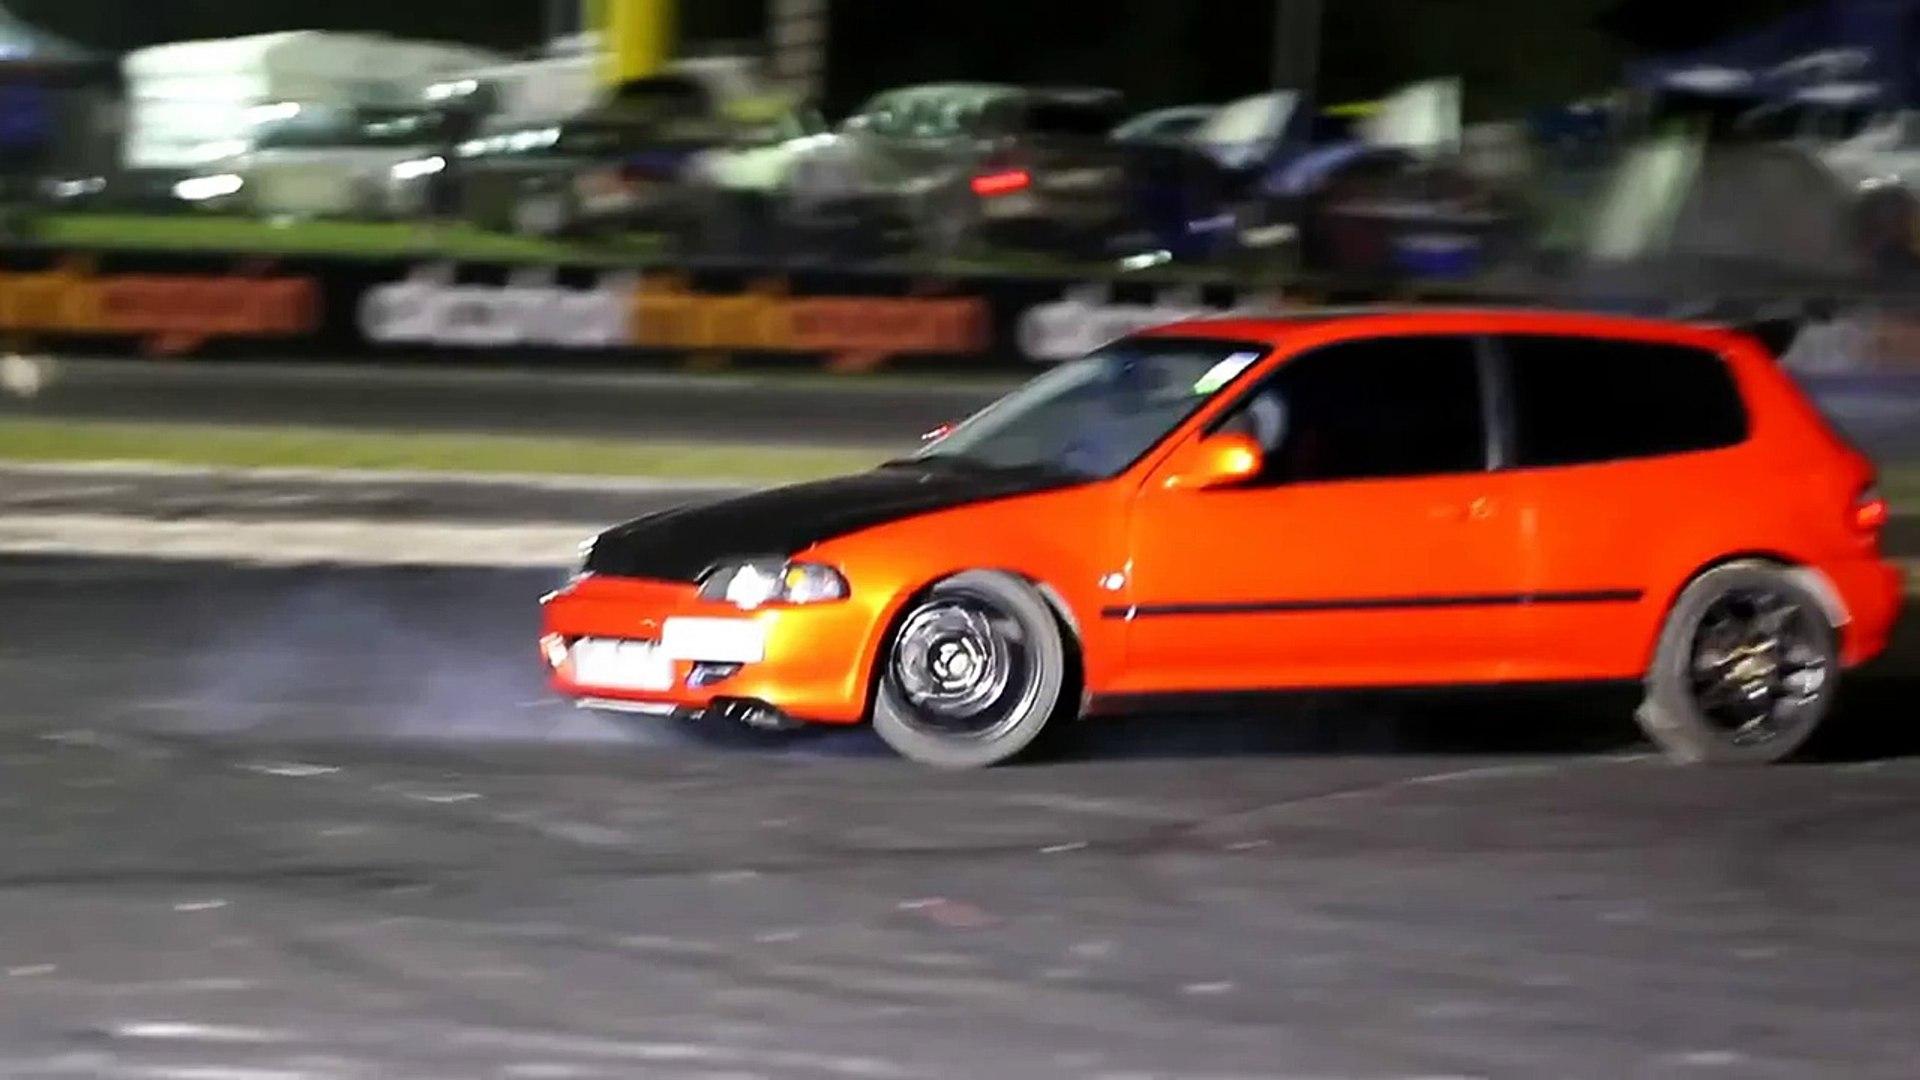 Powercruise Perth #38 Insane Front Wheel Drive Skid